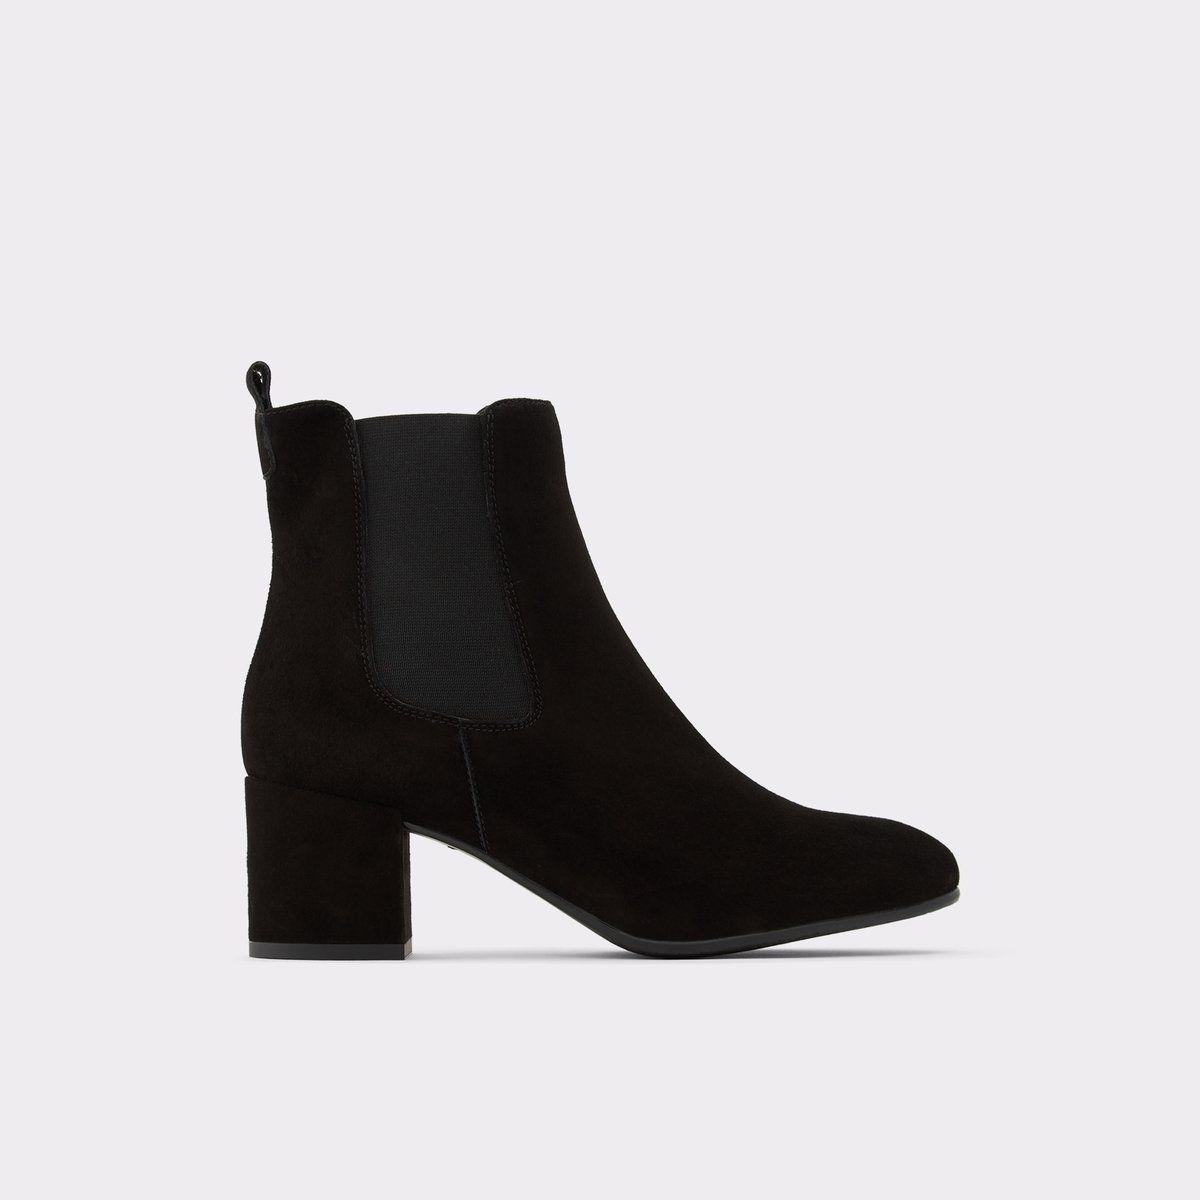 dress boots womens canada